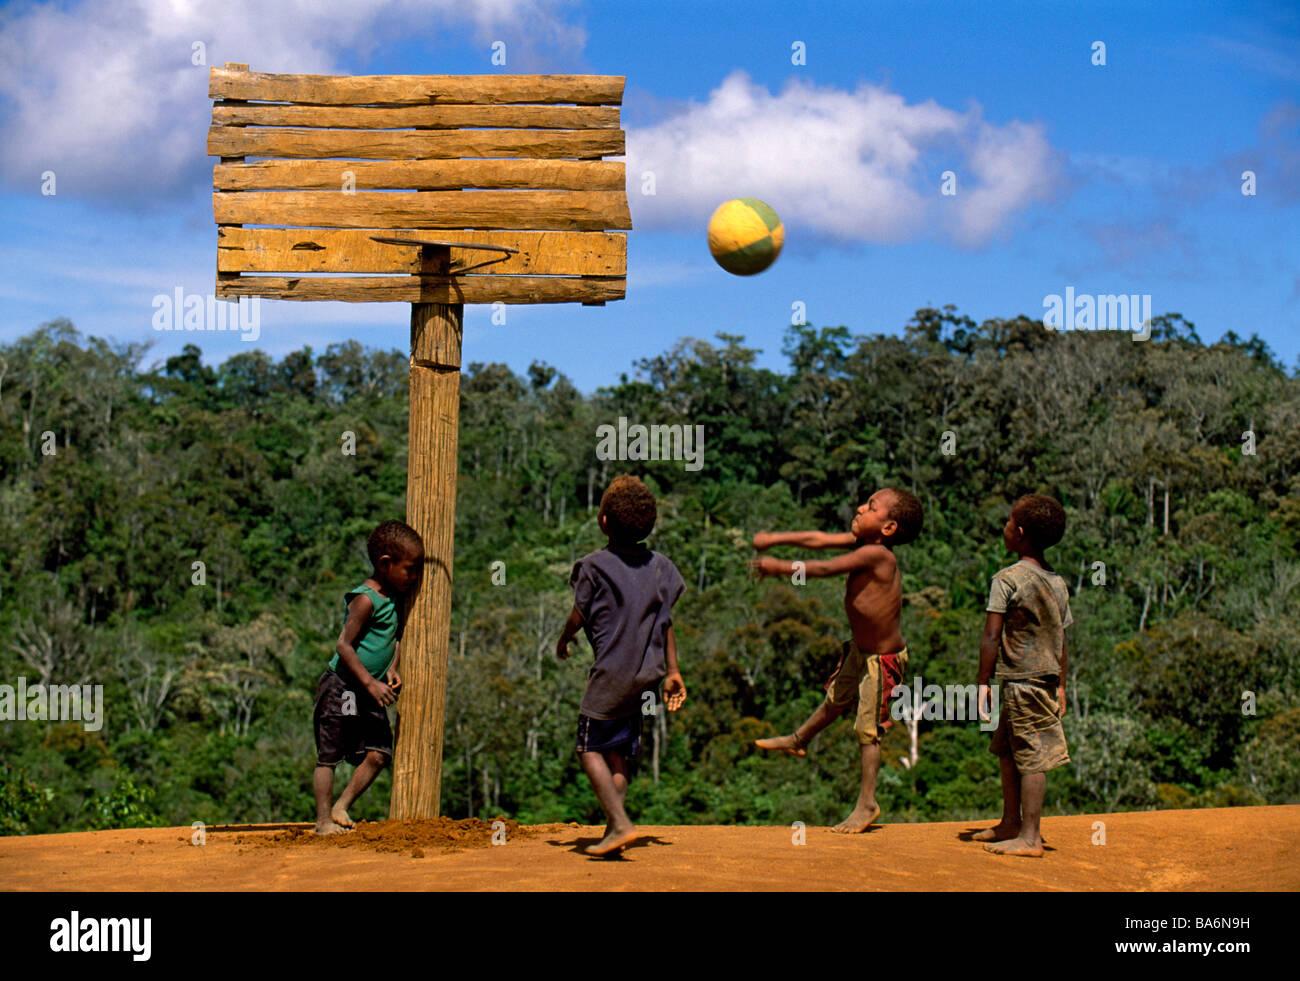 Papua New Guinea, Southern Highlands Province, Bosavi region, Suguniga, Kaluli Tribe, Uluye Wilie, Timon Sebo, Welo - Stock Image